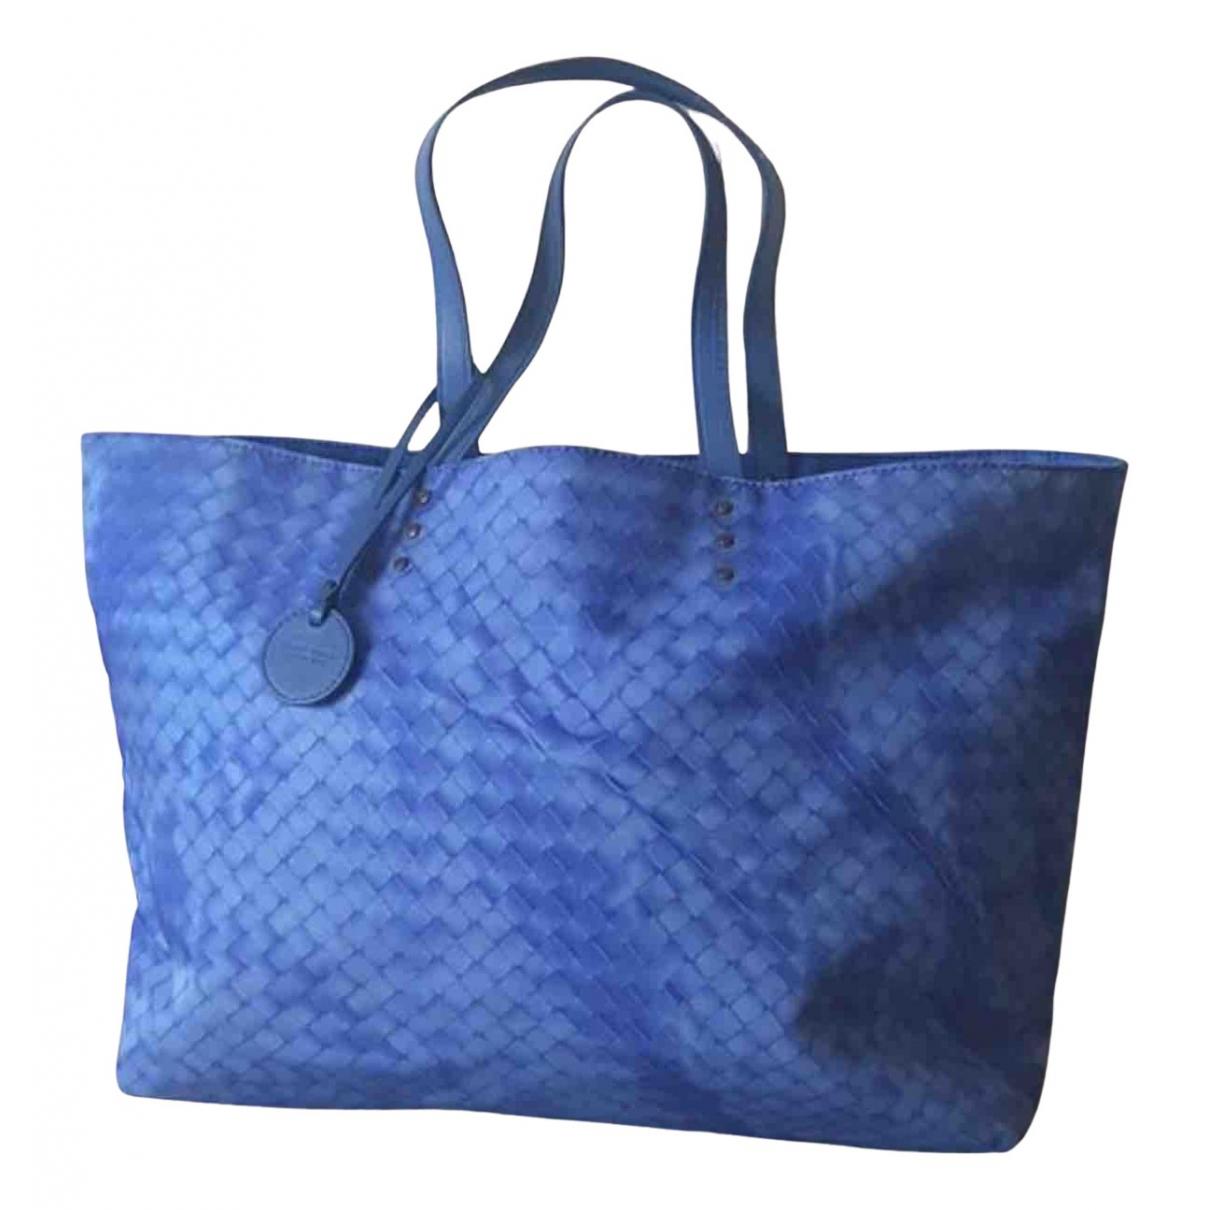 Bottega Veneta - Sac a main Fourre-Tout  pour femme en toile - bleu